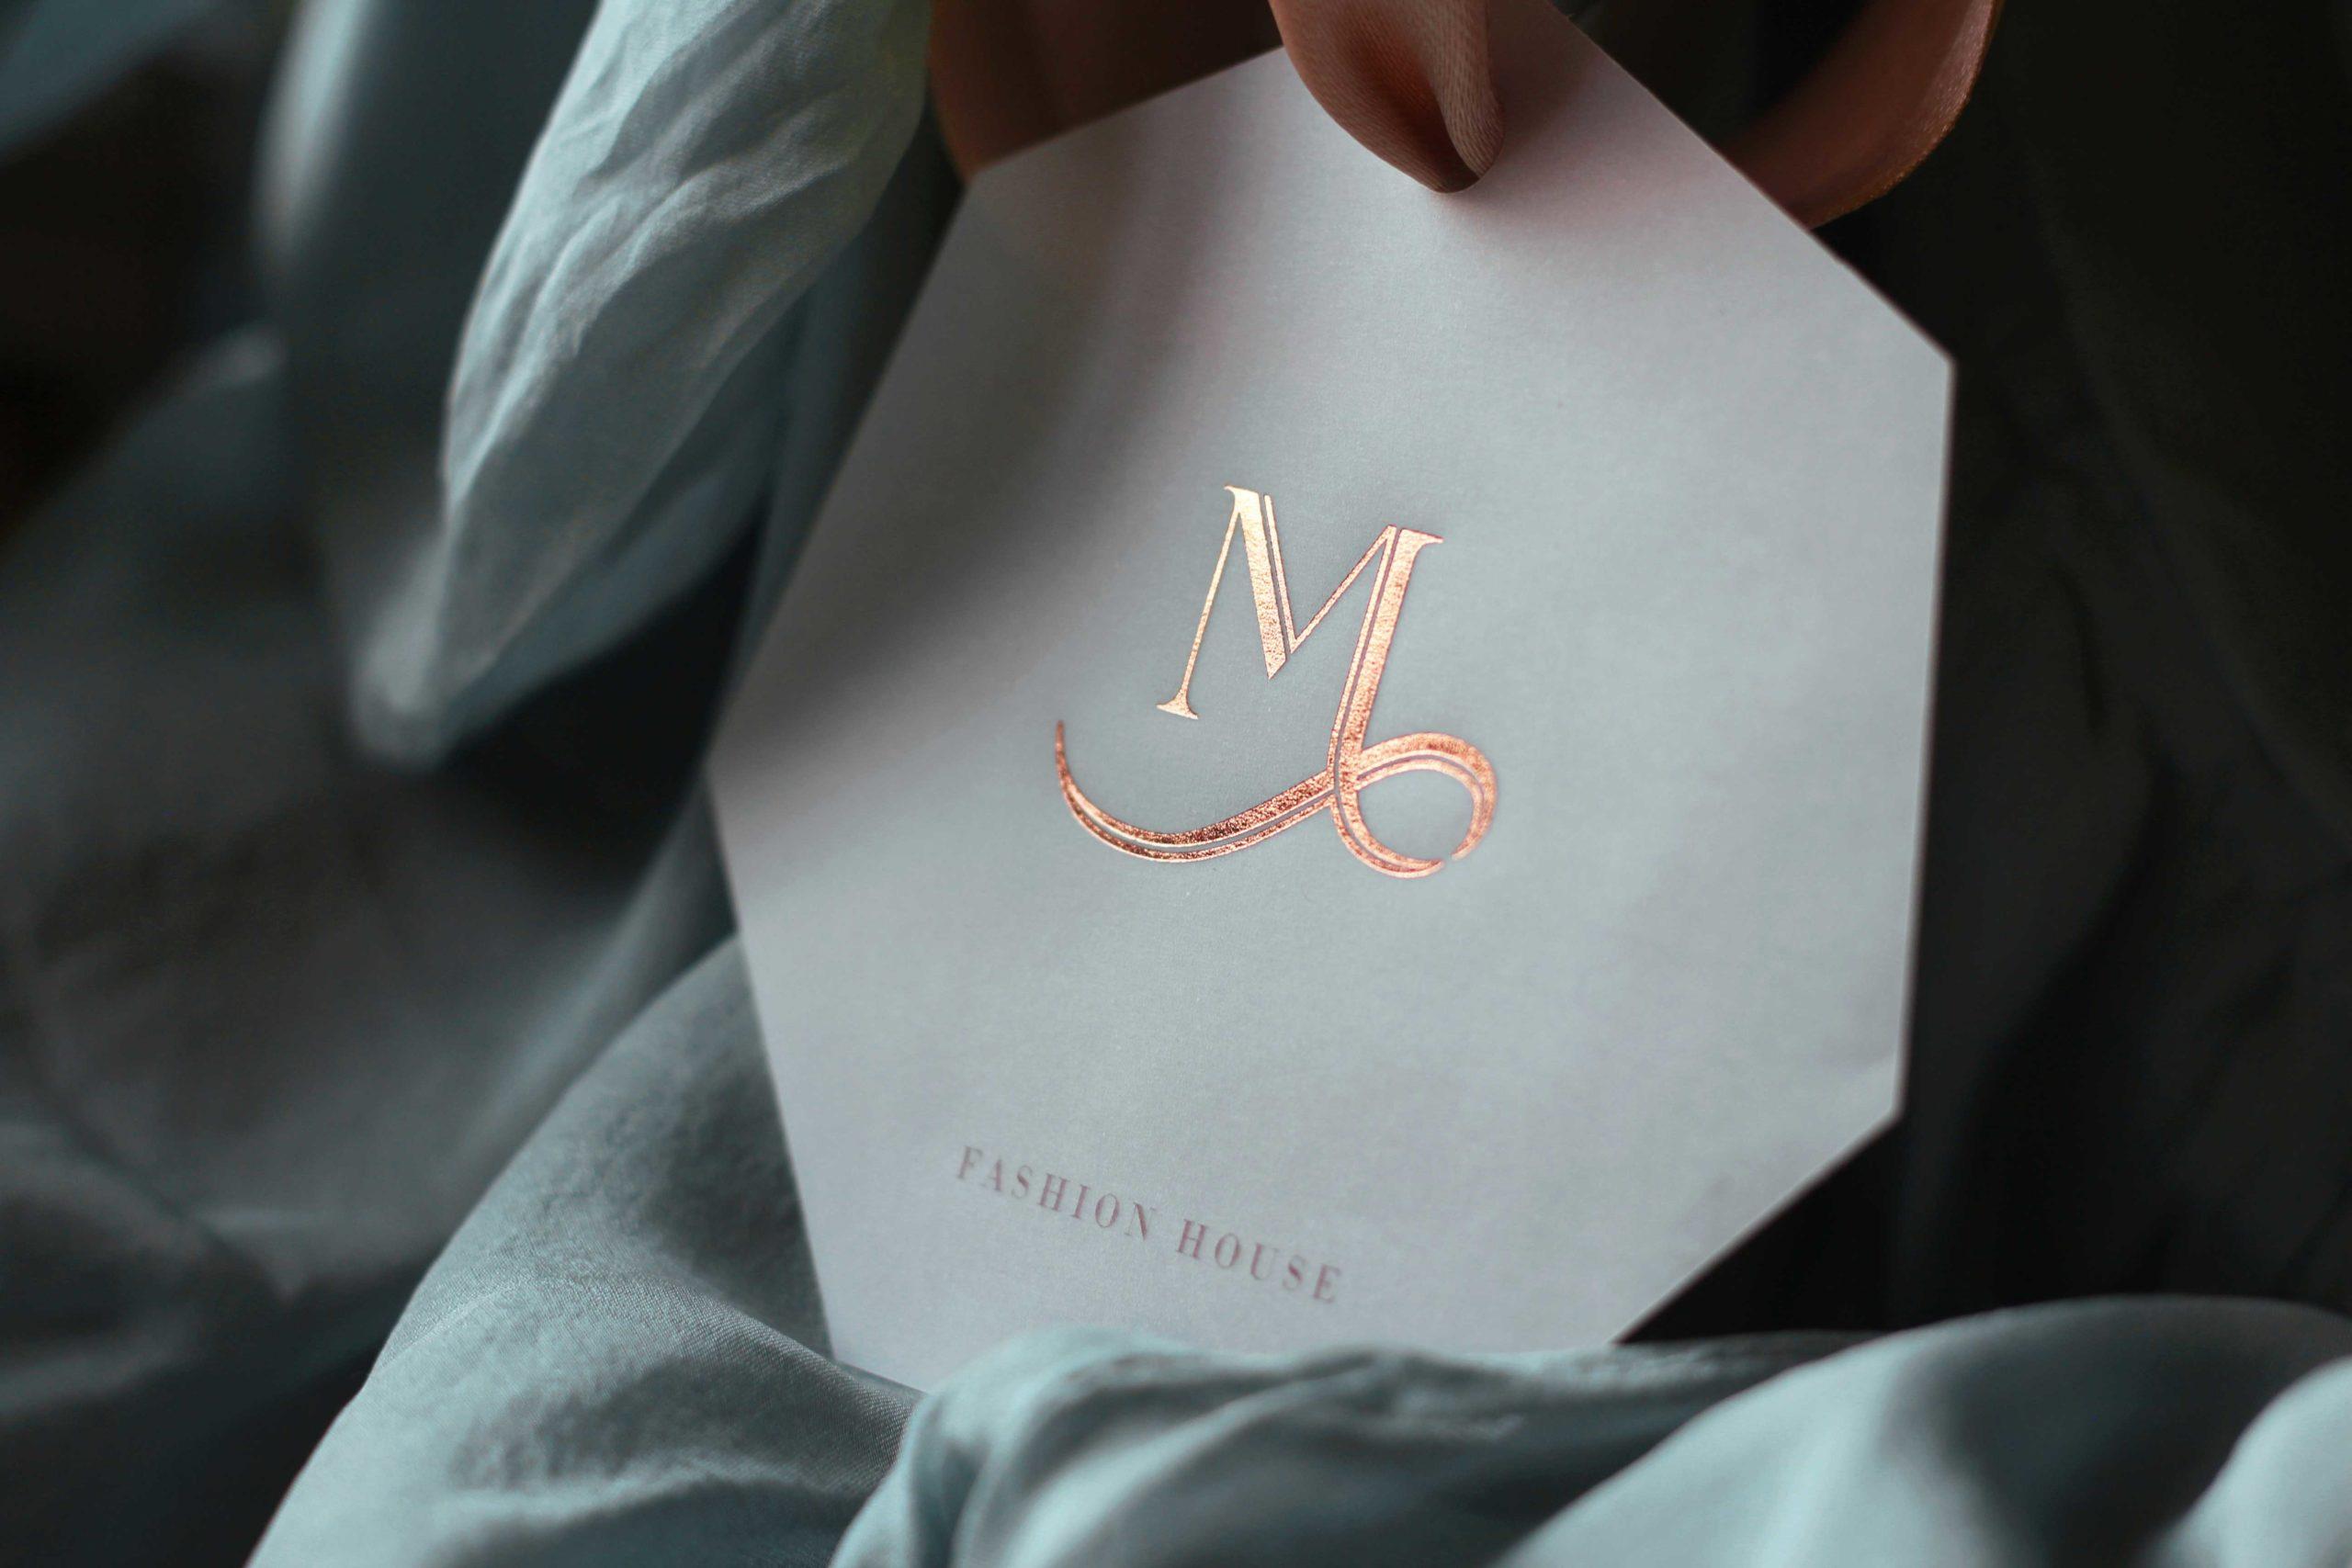 Mirna_Fashion_label-1